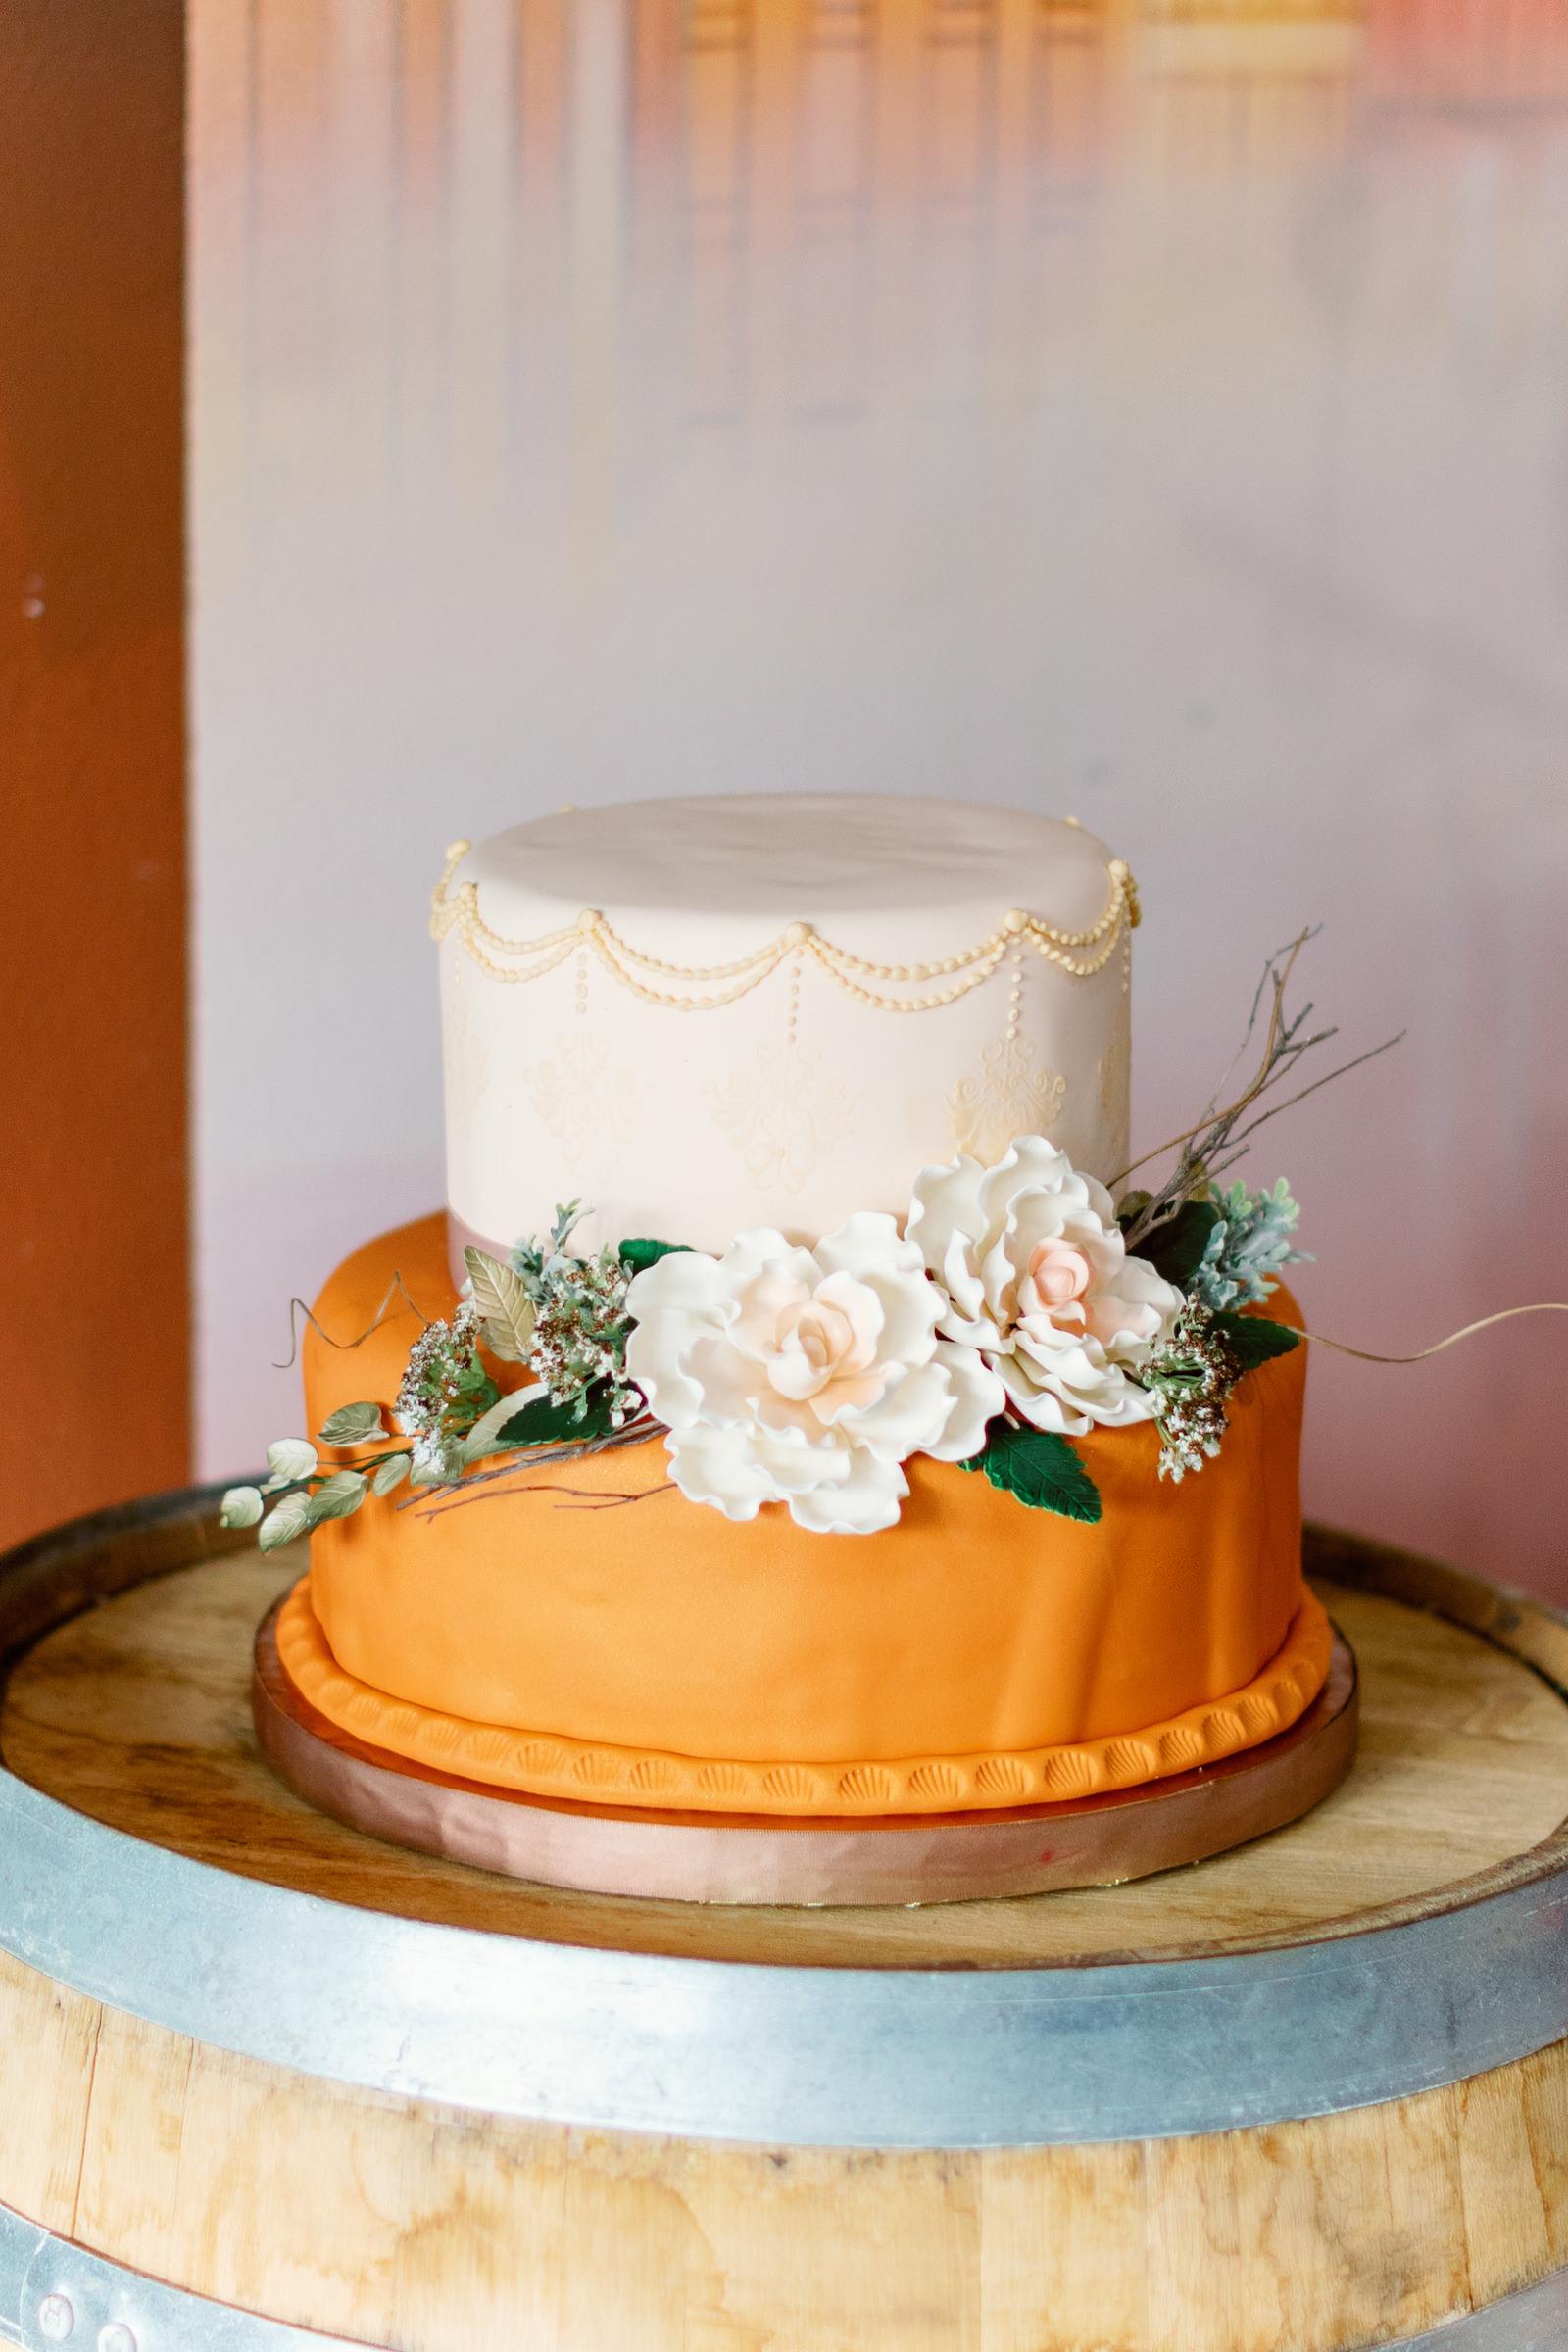 Modern Boho Two Tier White and Orange Wedding Cake with Sugar Flowers